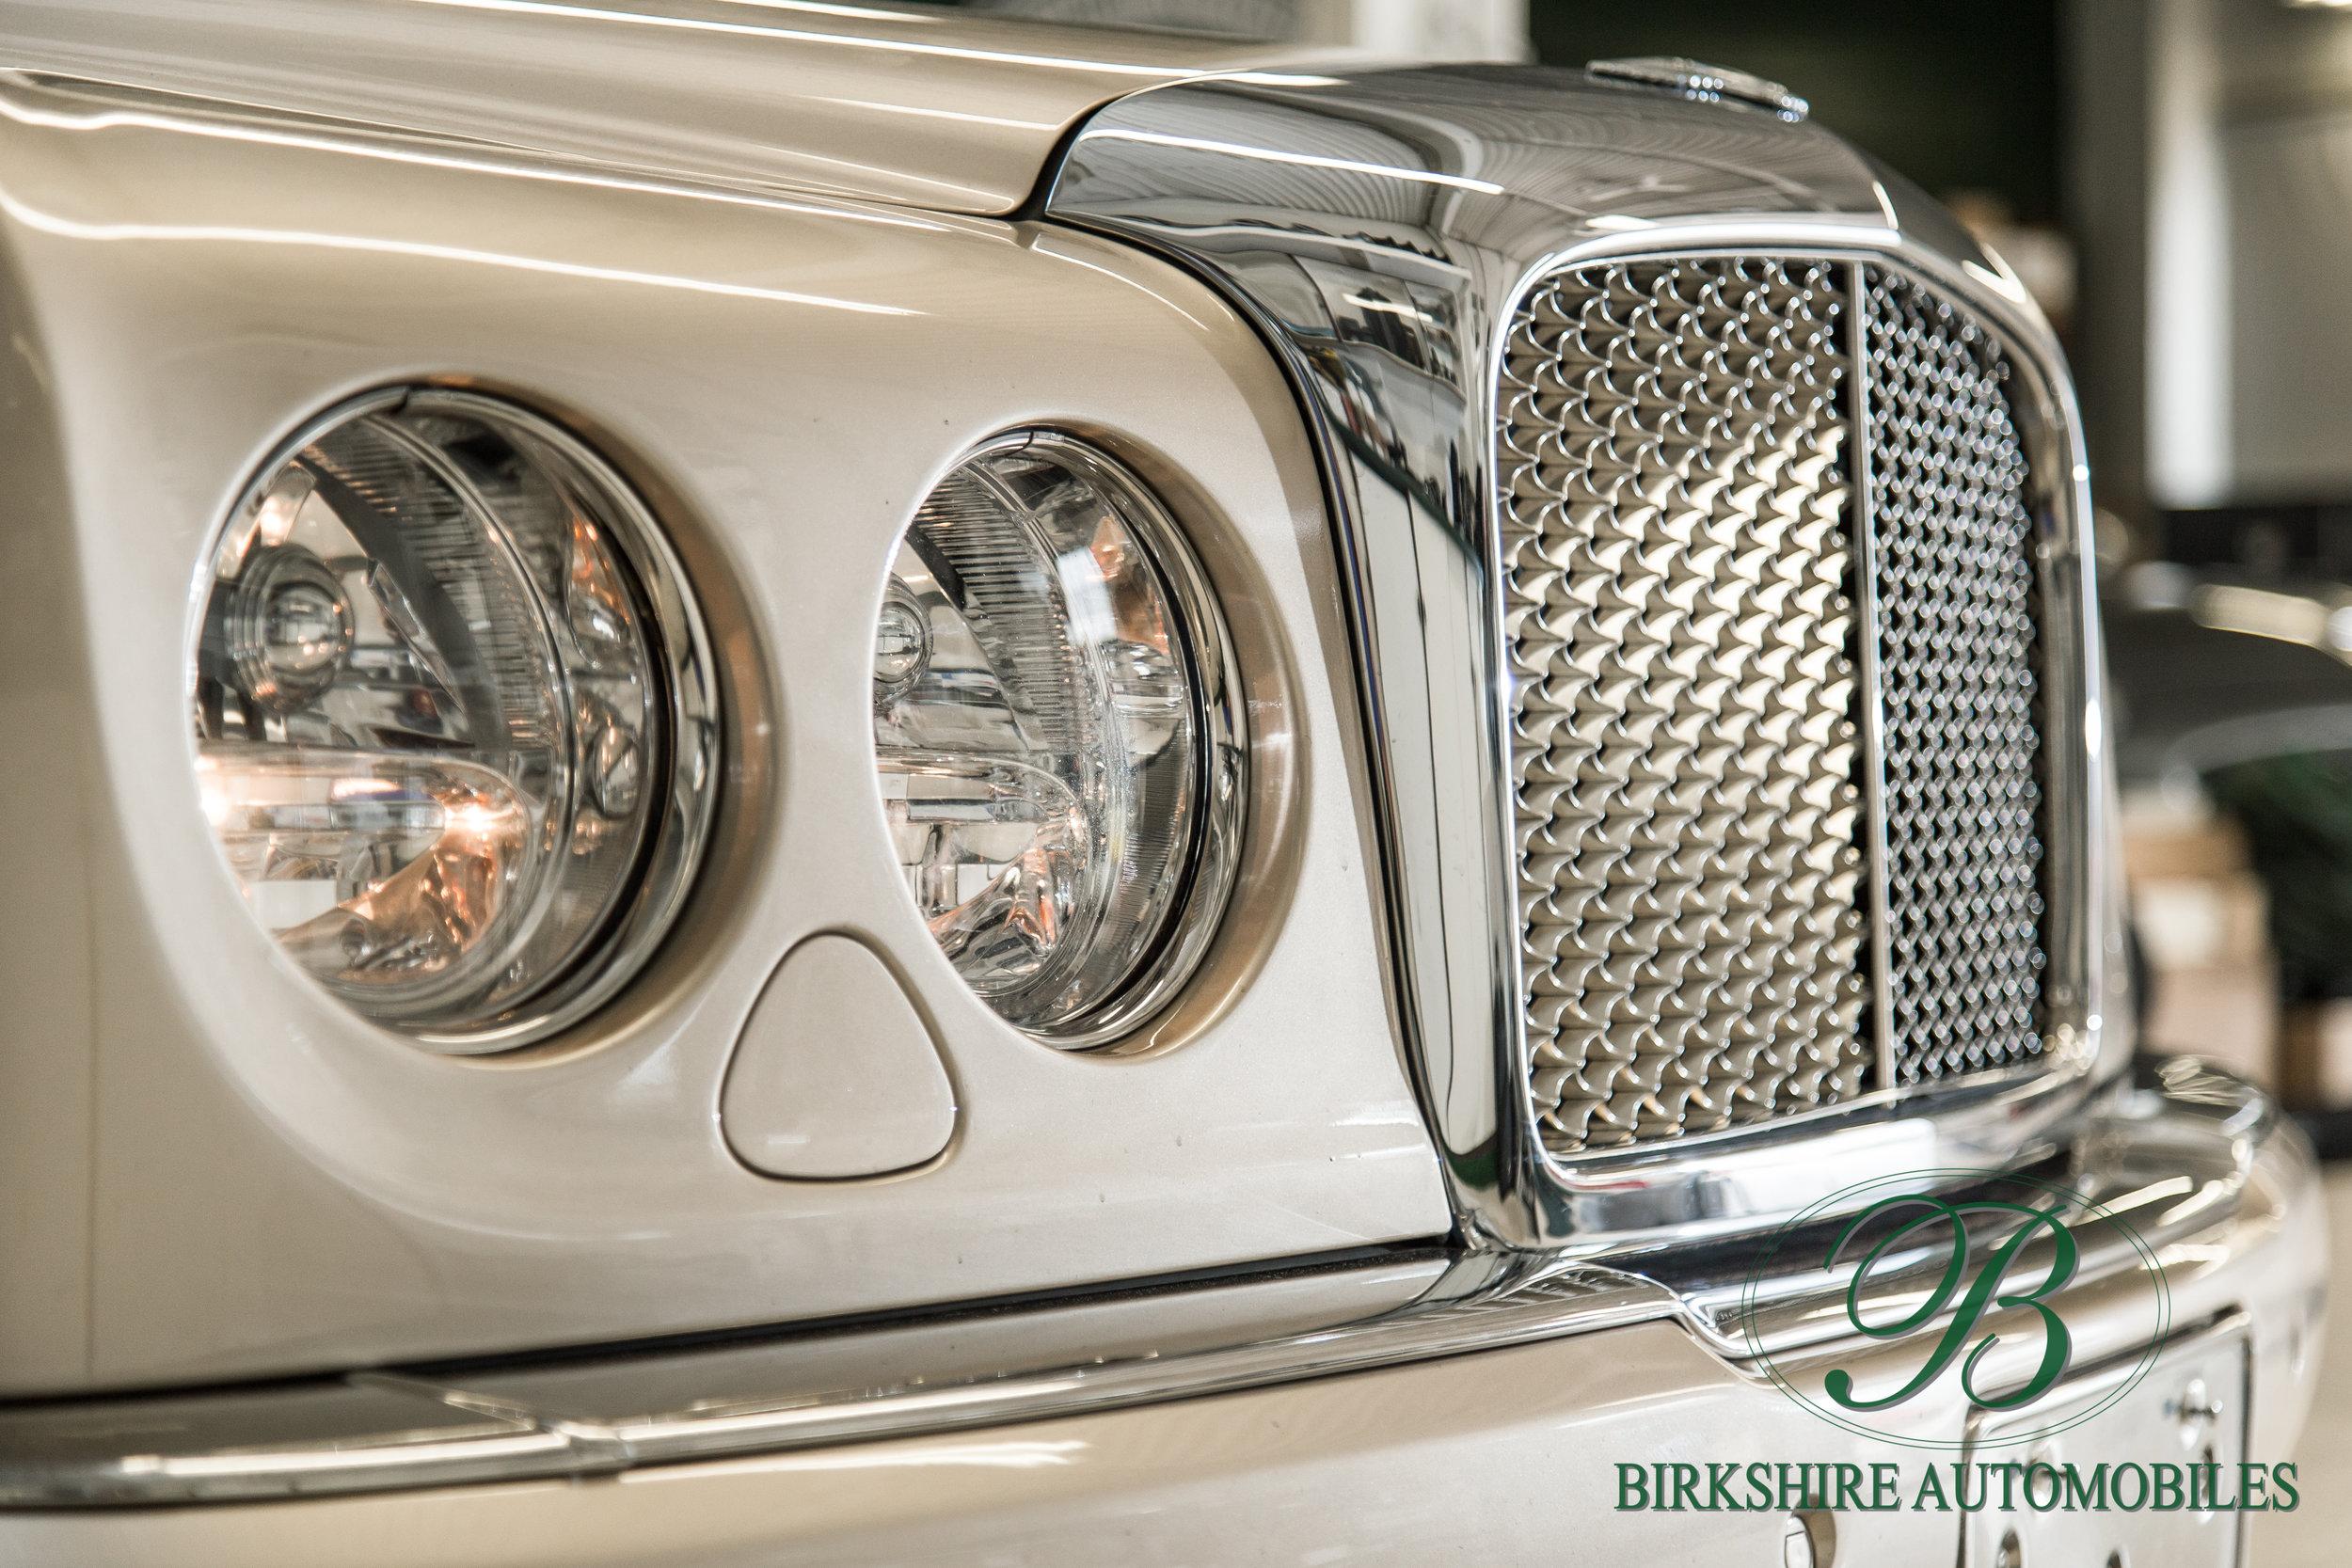 Birkshire Automobiles-328.jpg